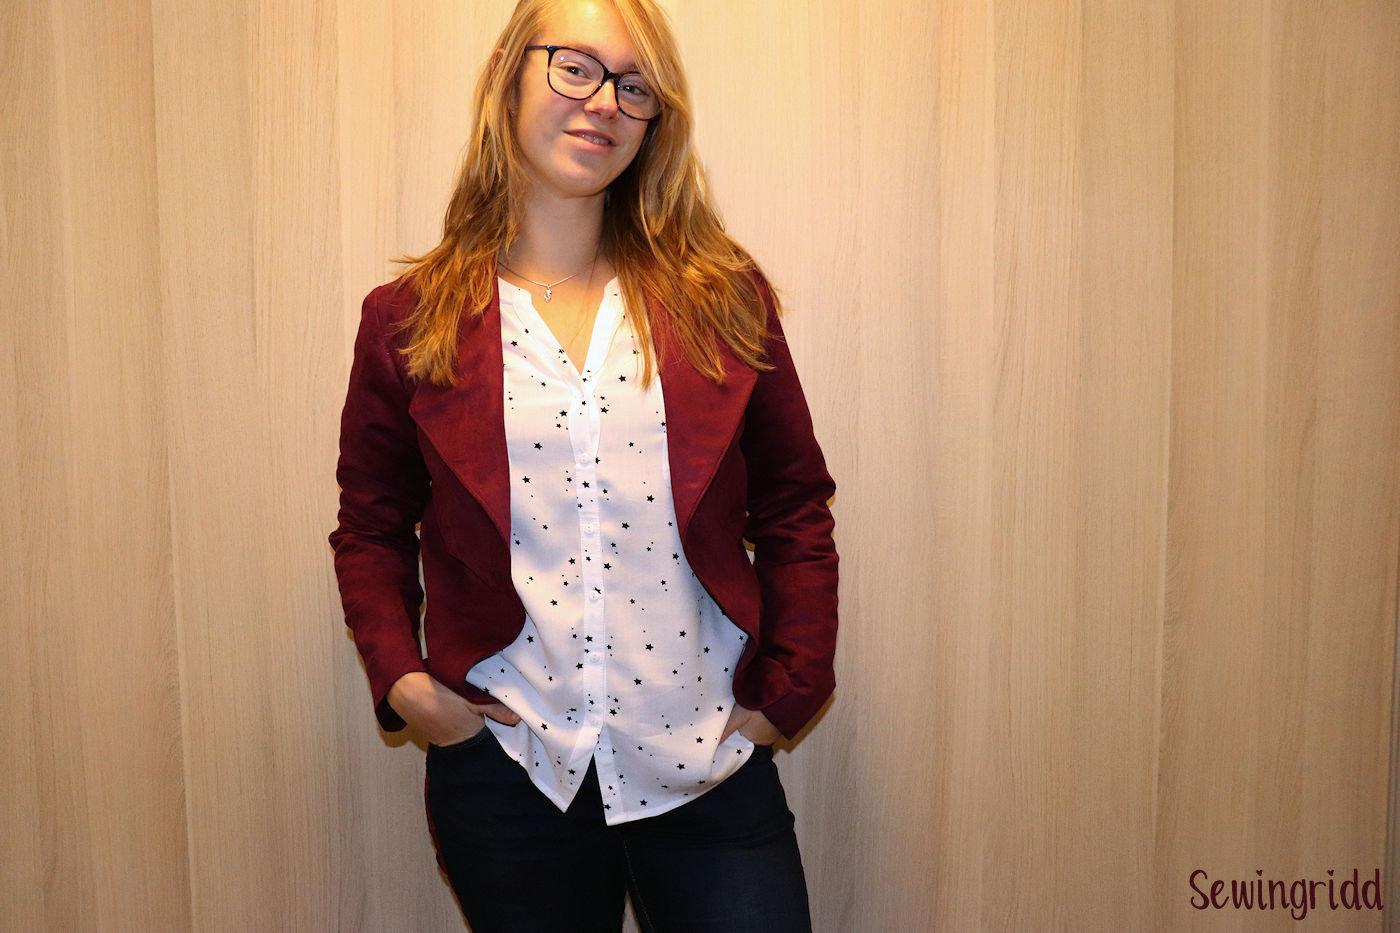 Purple suede jacket sewn by Sewingridd